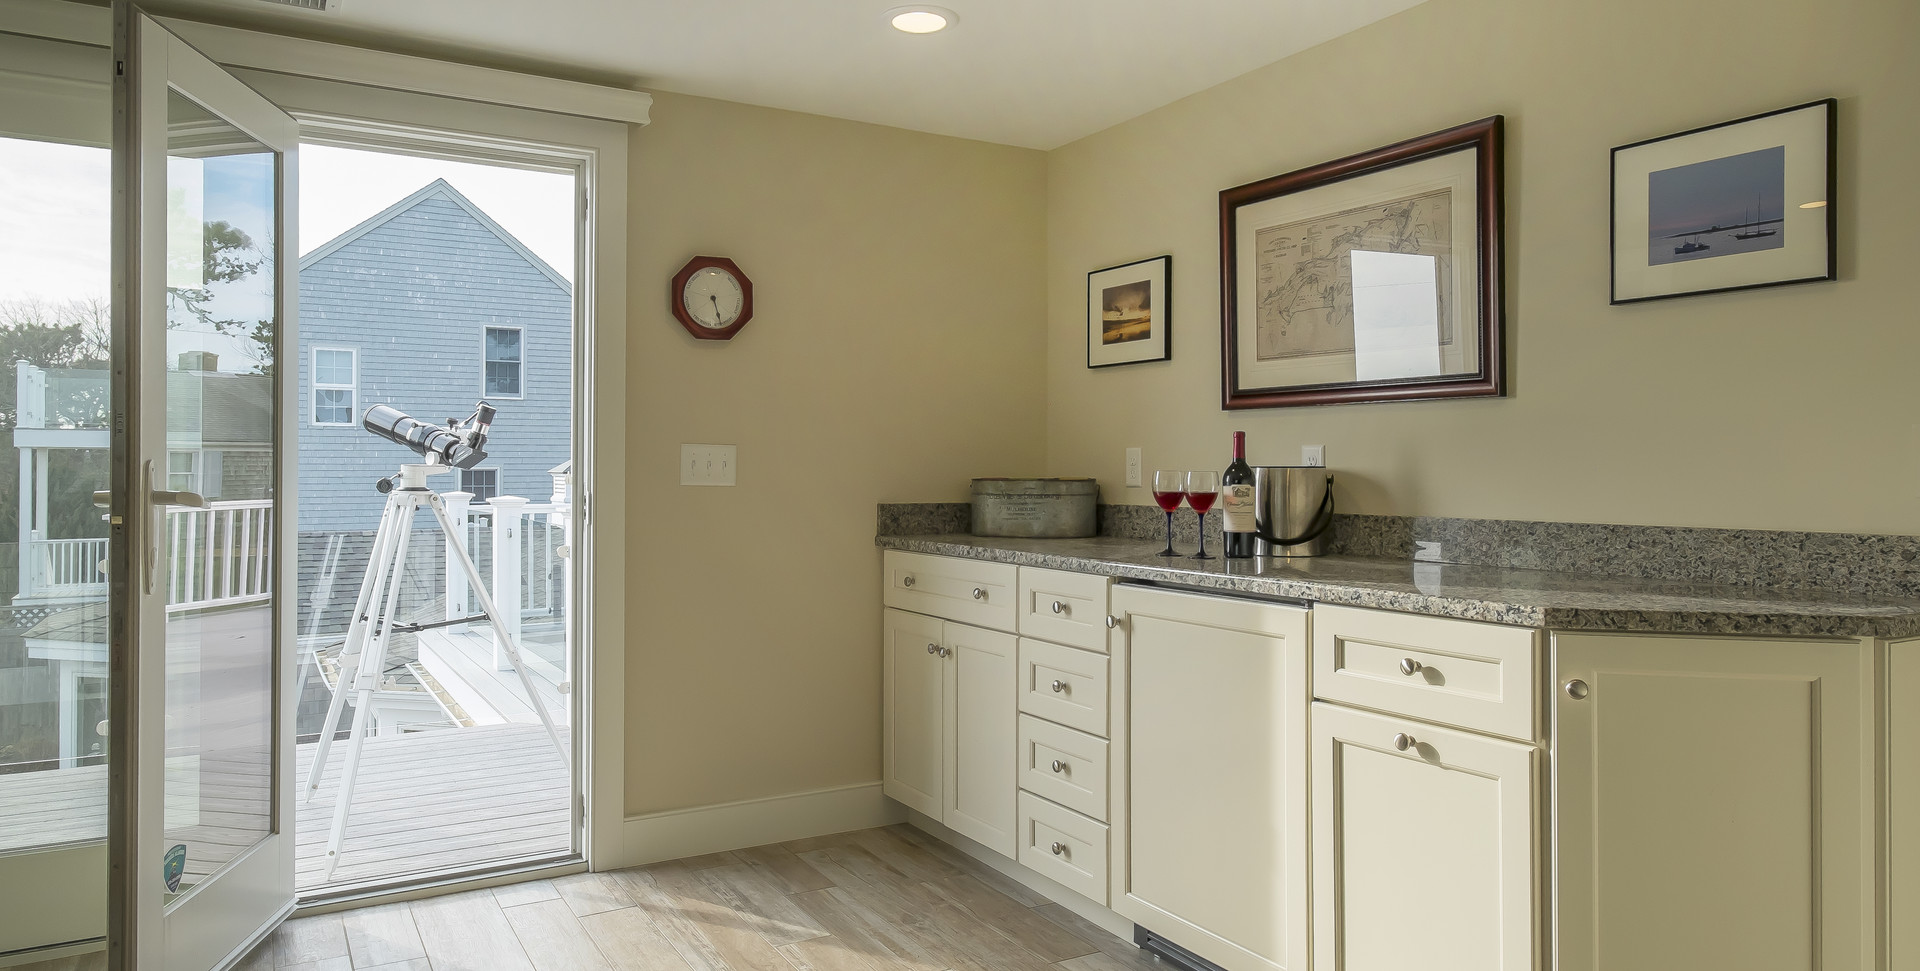 Ridgevale Beach, West Chatham, MA, Home Remodel, bathroom remodel